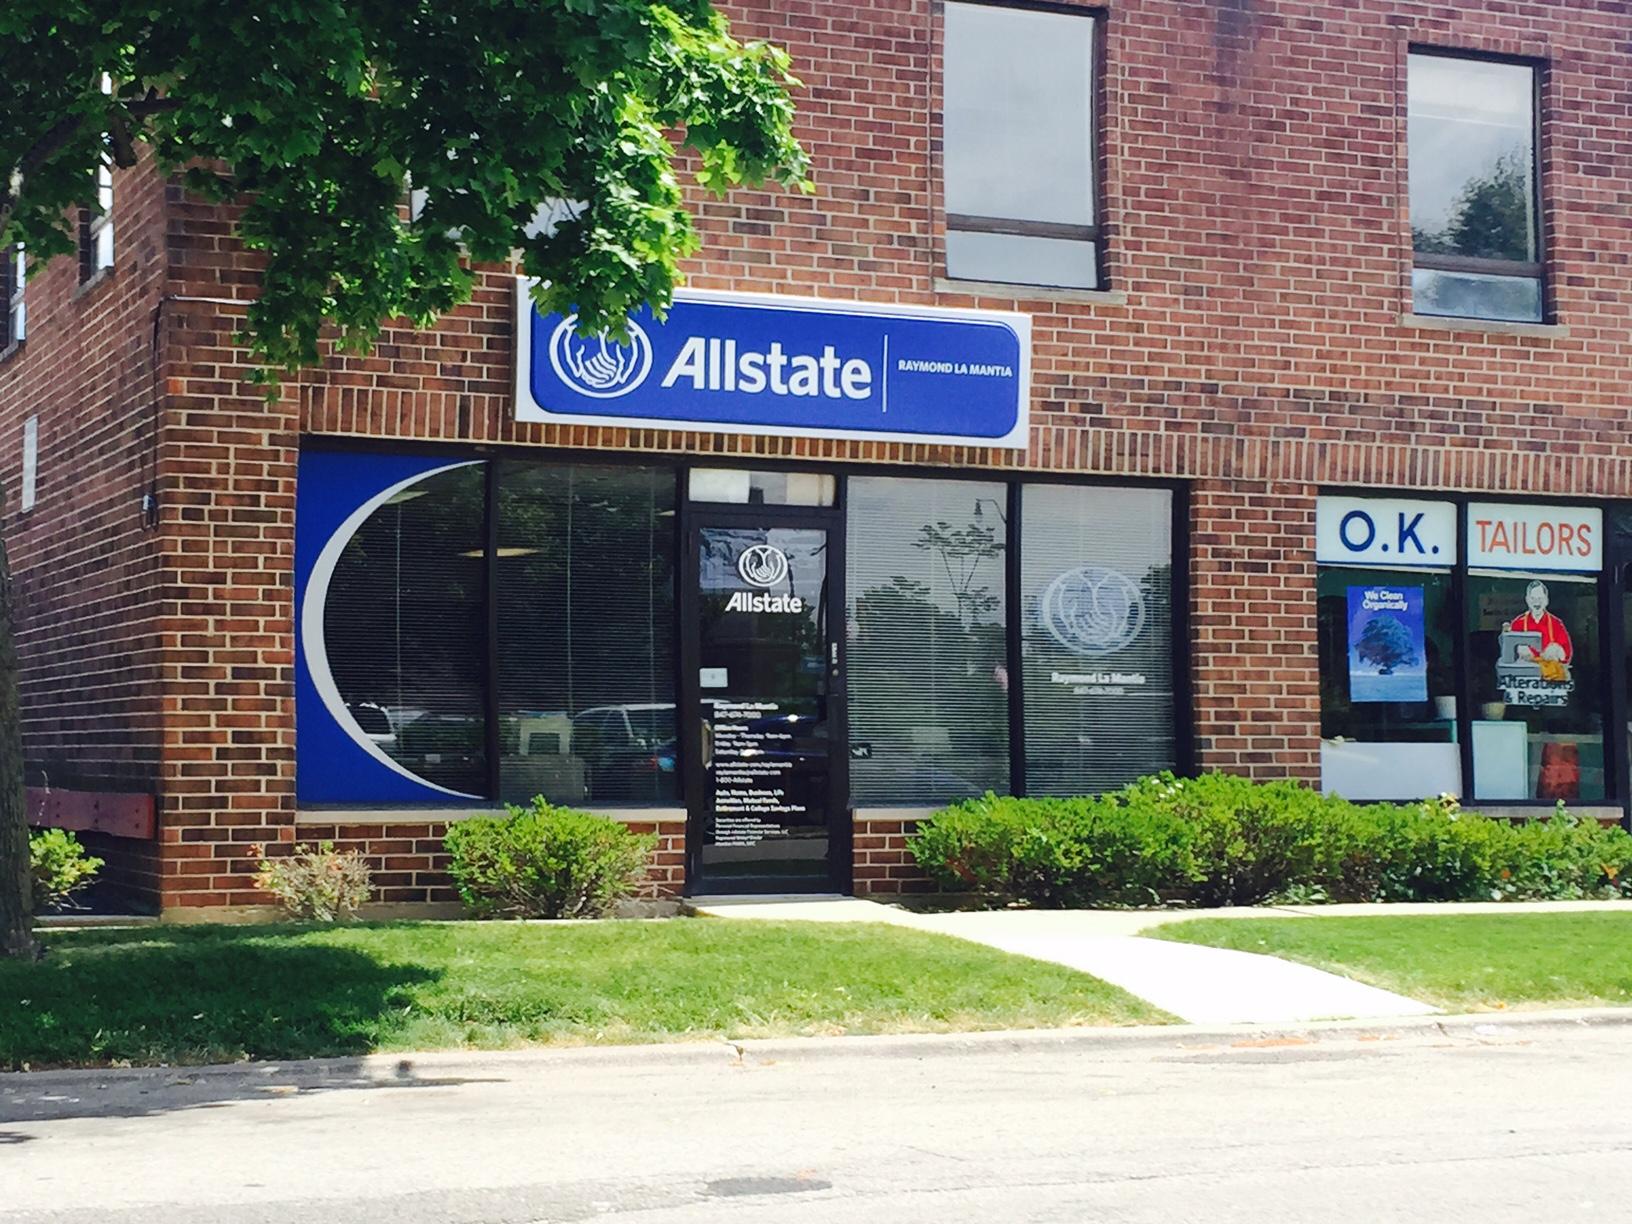 Allstate Insurance Agent: Raymond La Mantia image 1